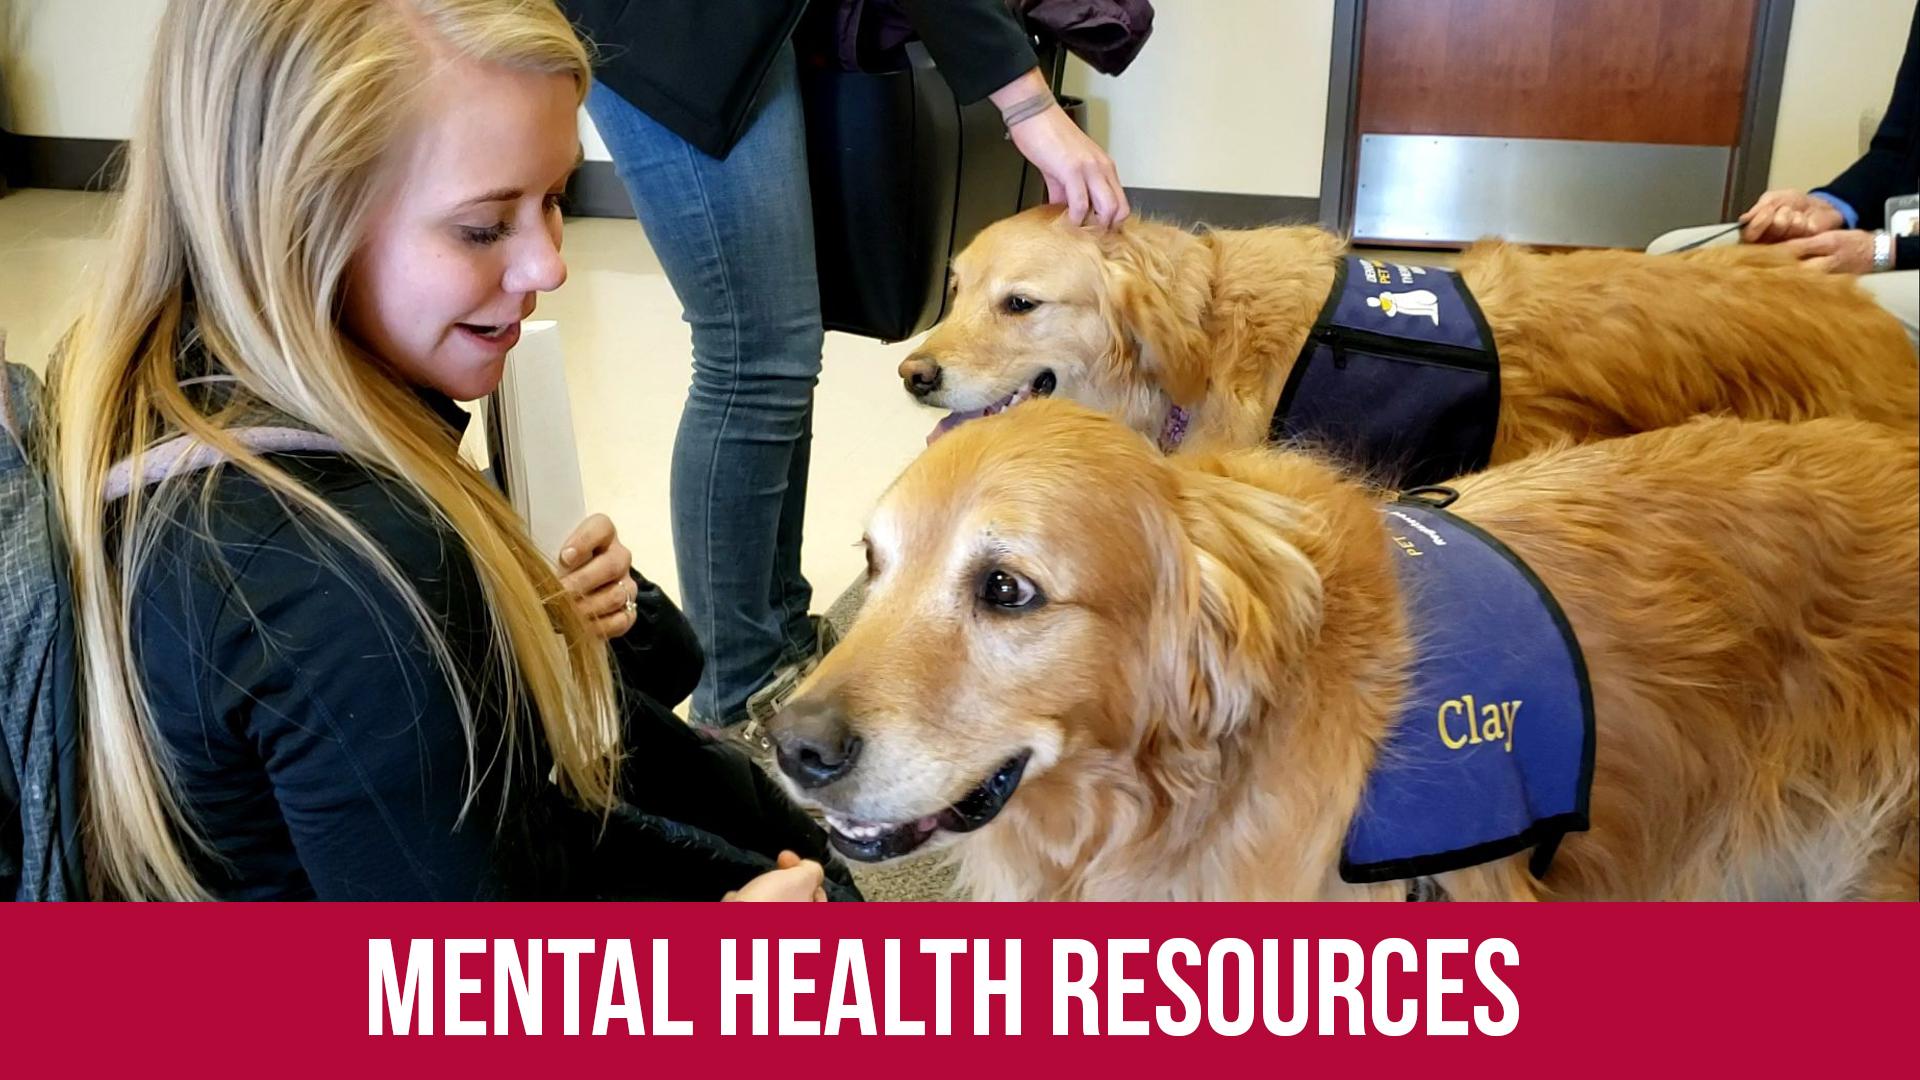 Box Mental Health Resources